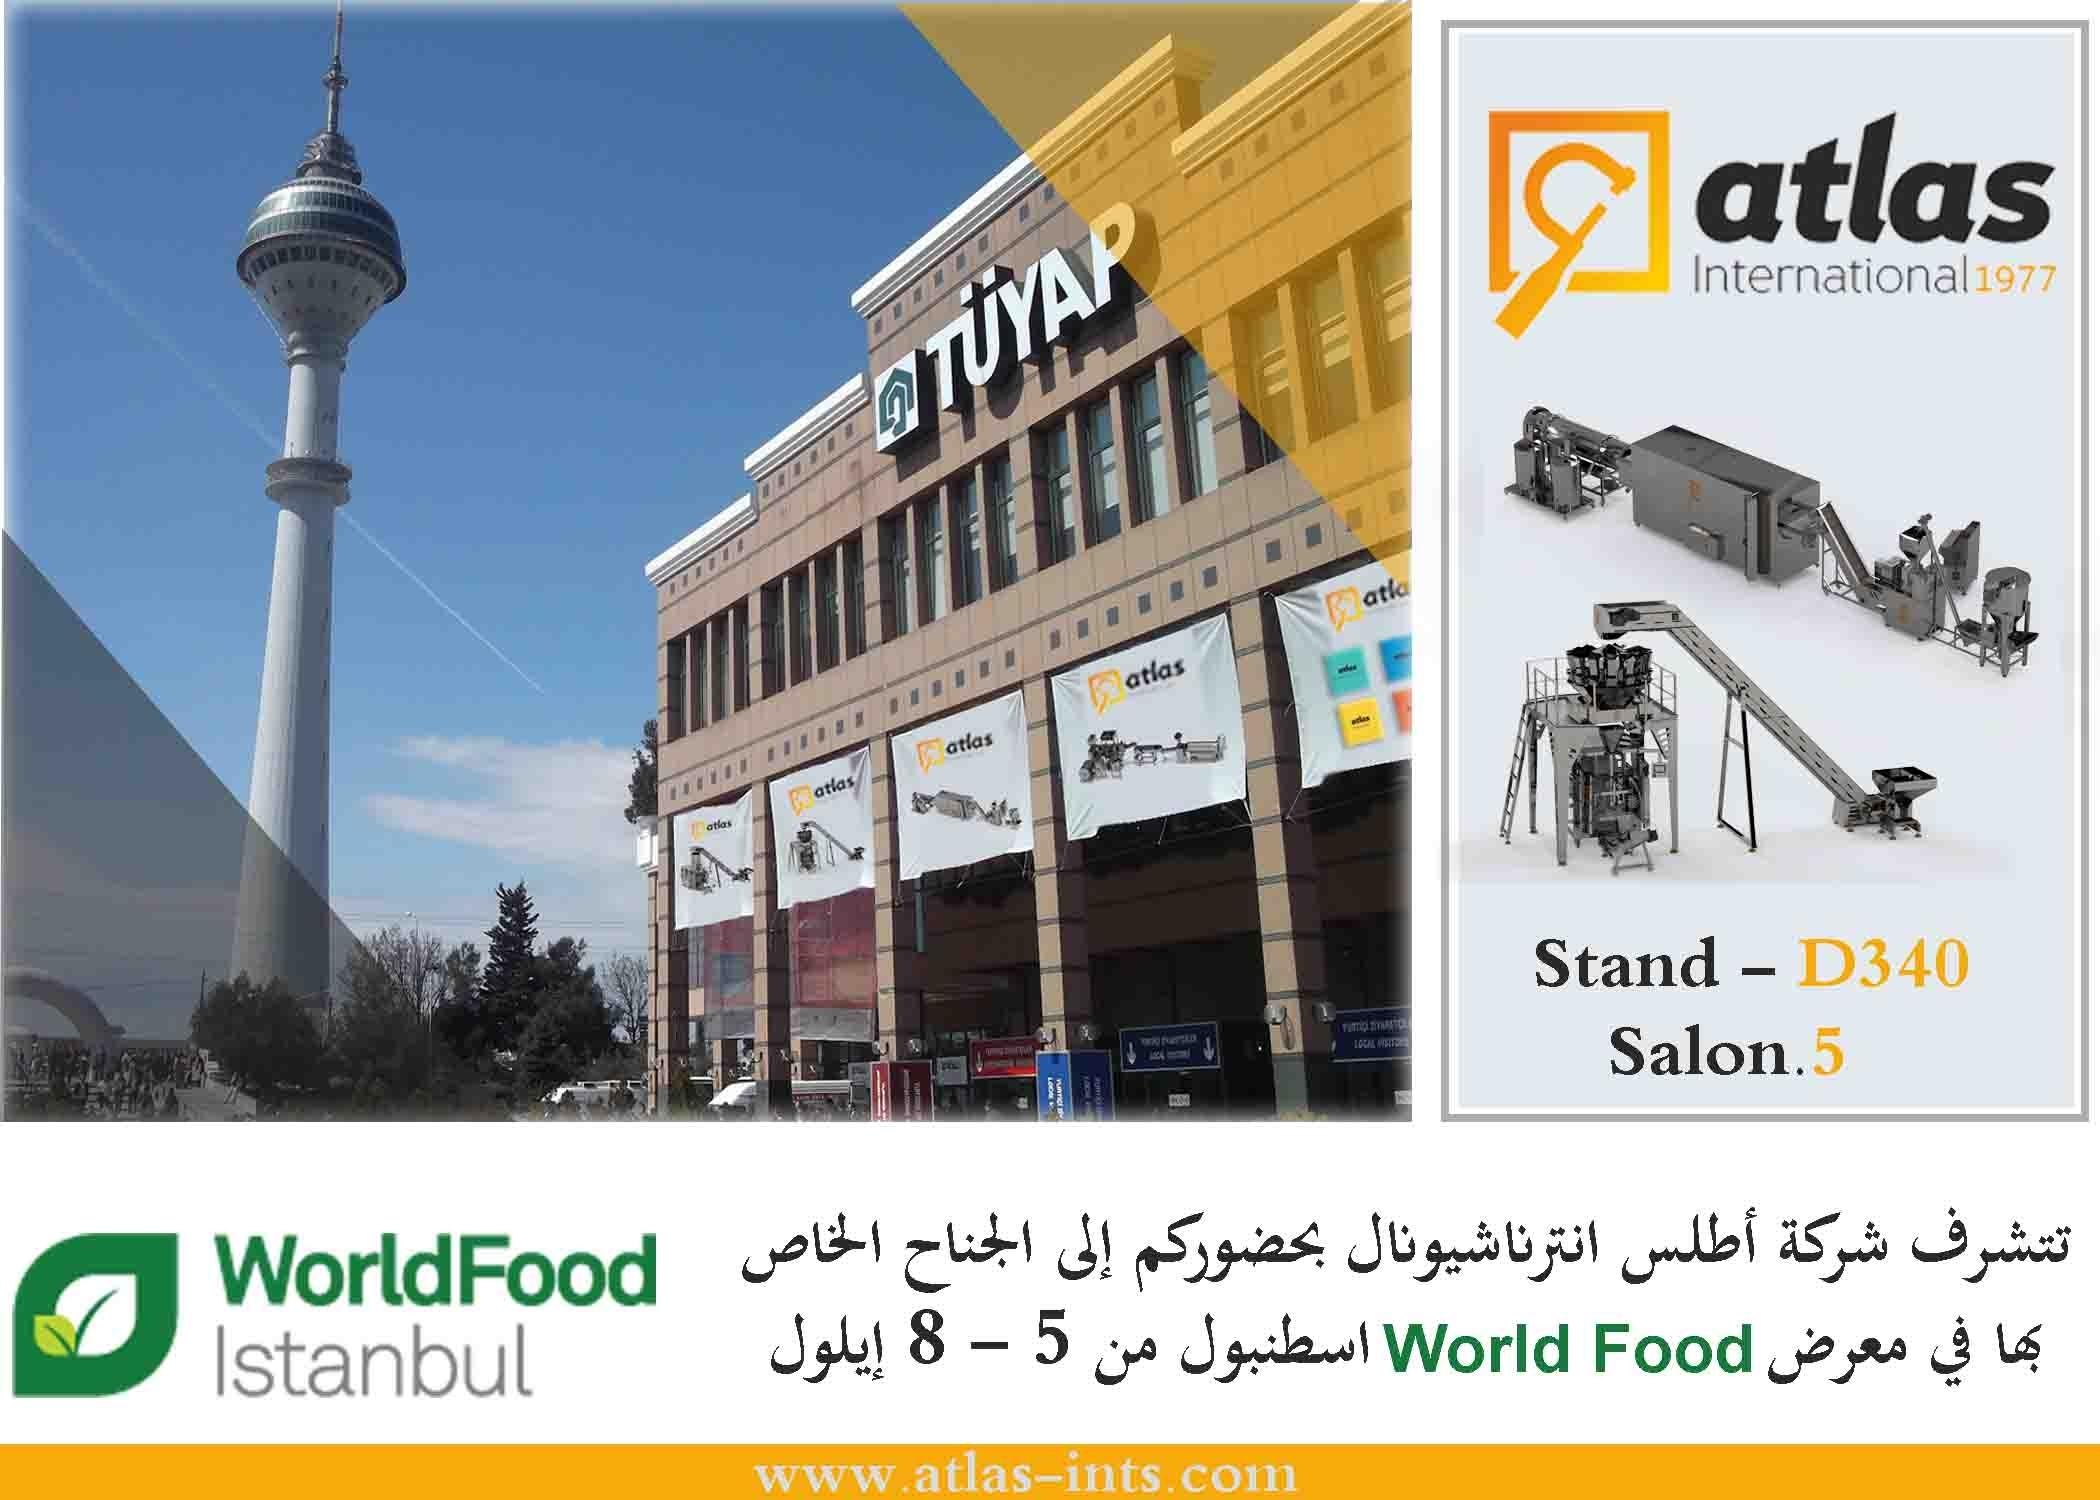 معرض World Food اسطنبول